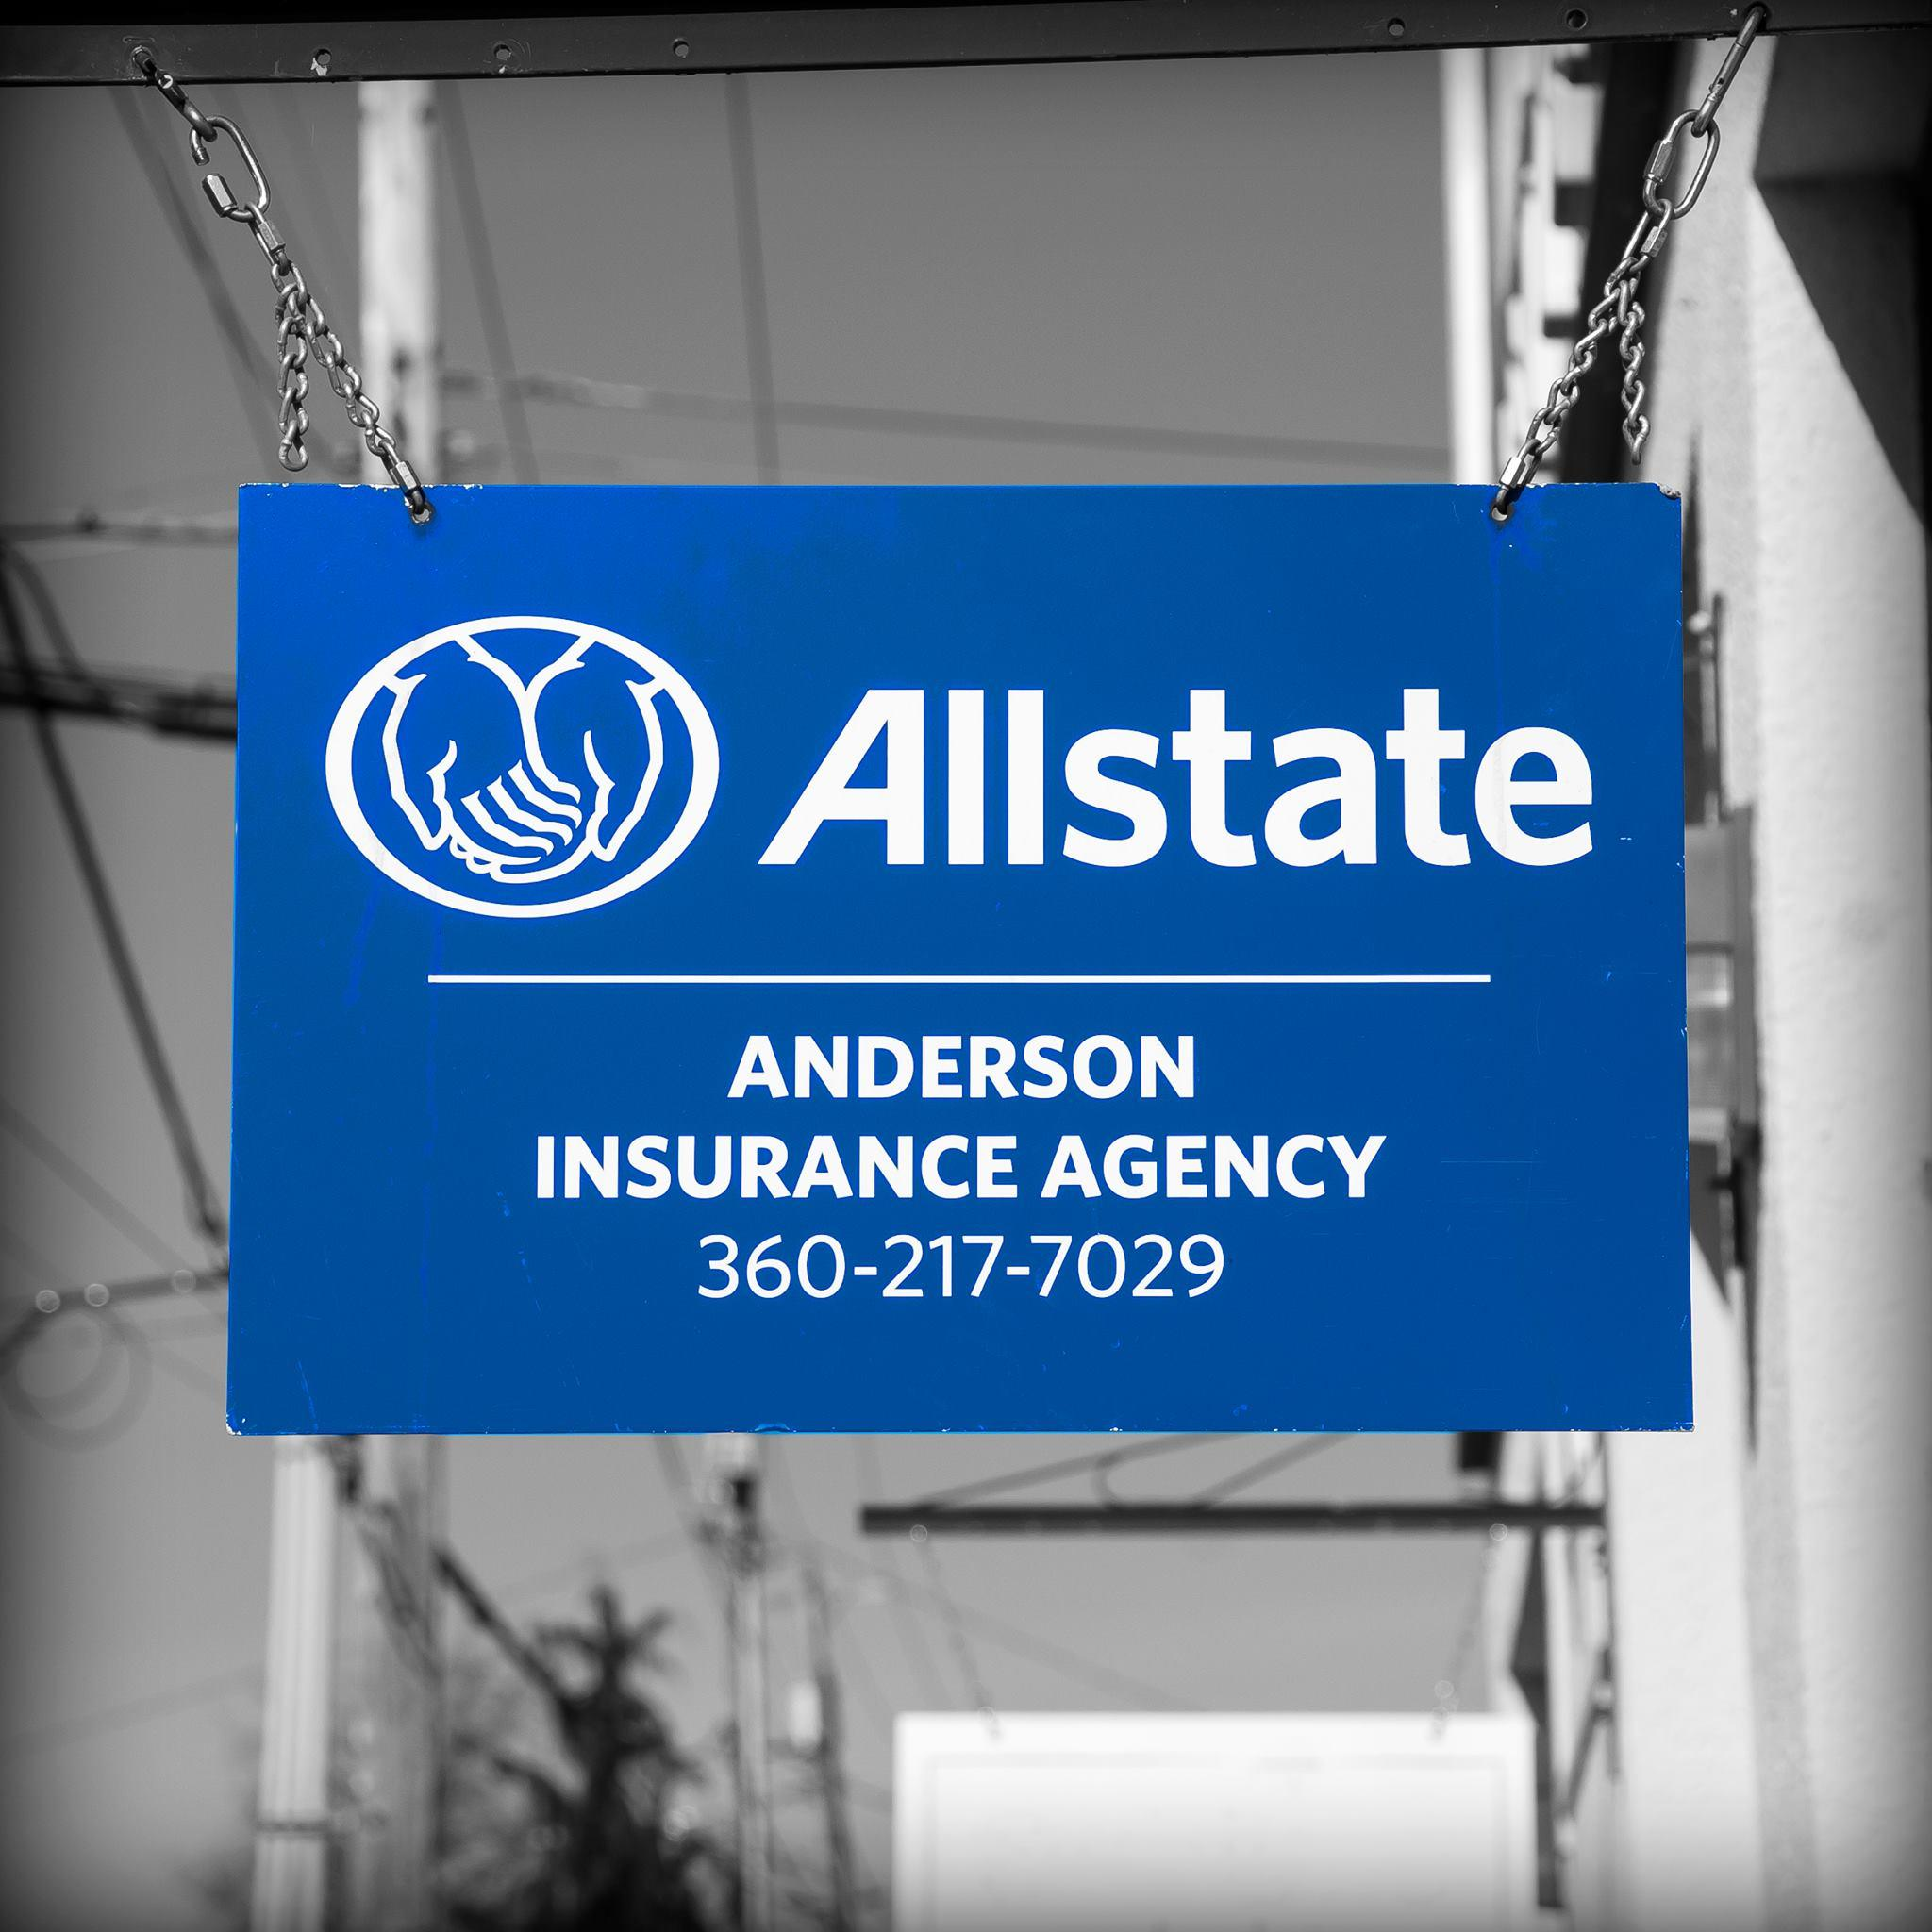 Allstate Car Insurance: Car Insurance In Snohomish, WA - Robert Anderson